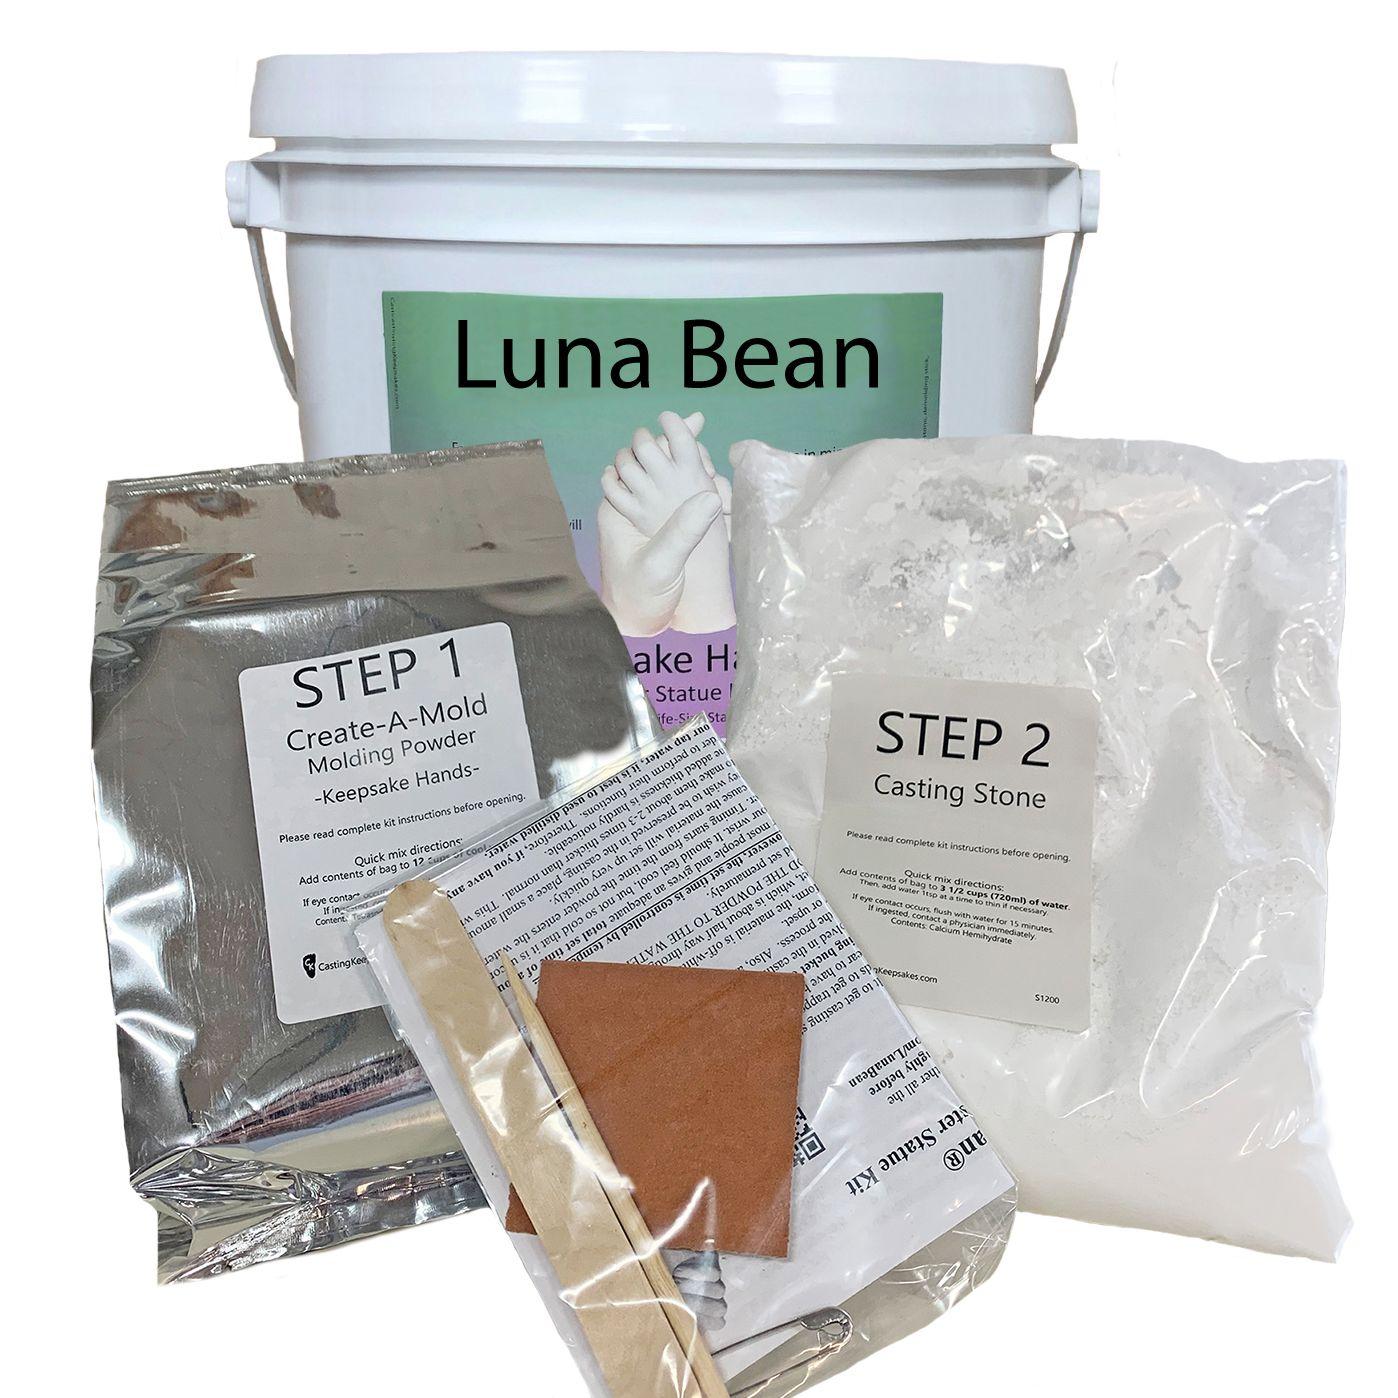 Luna Bean Keepsake Hands Plaster Statue Kit In 2020 Casting Kit Keepsake Plastic Moulding